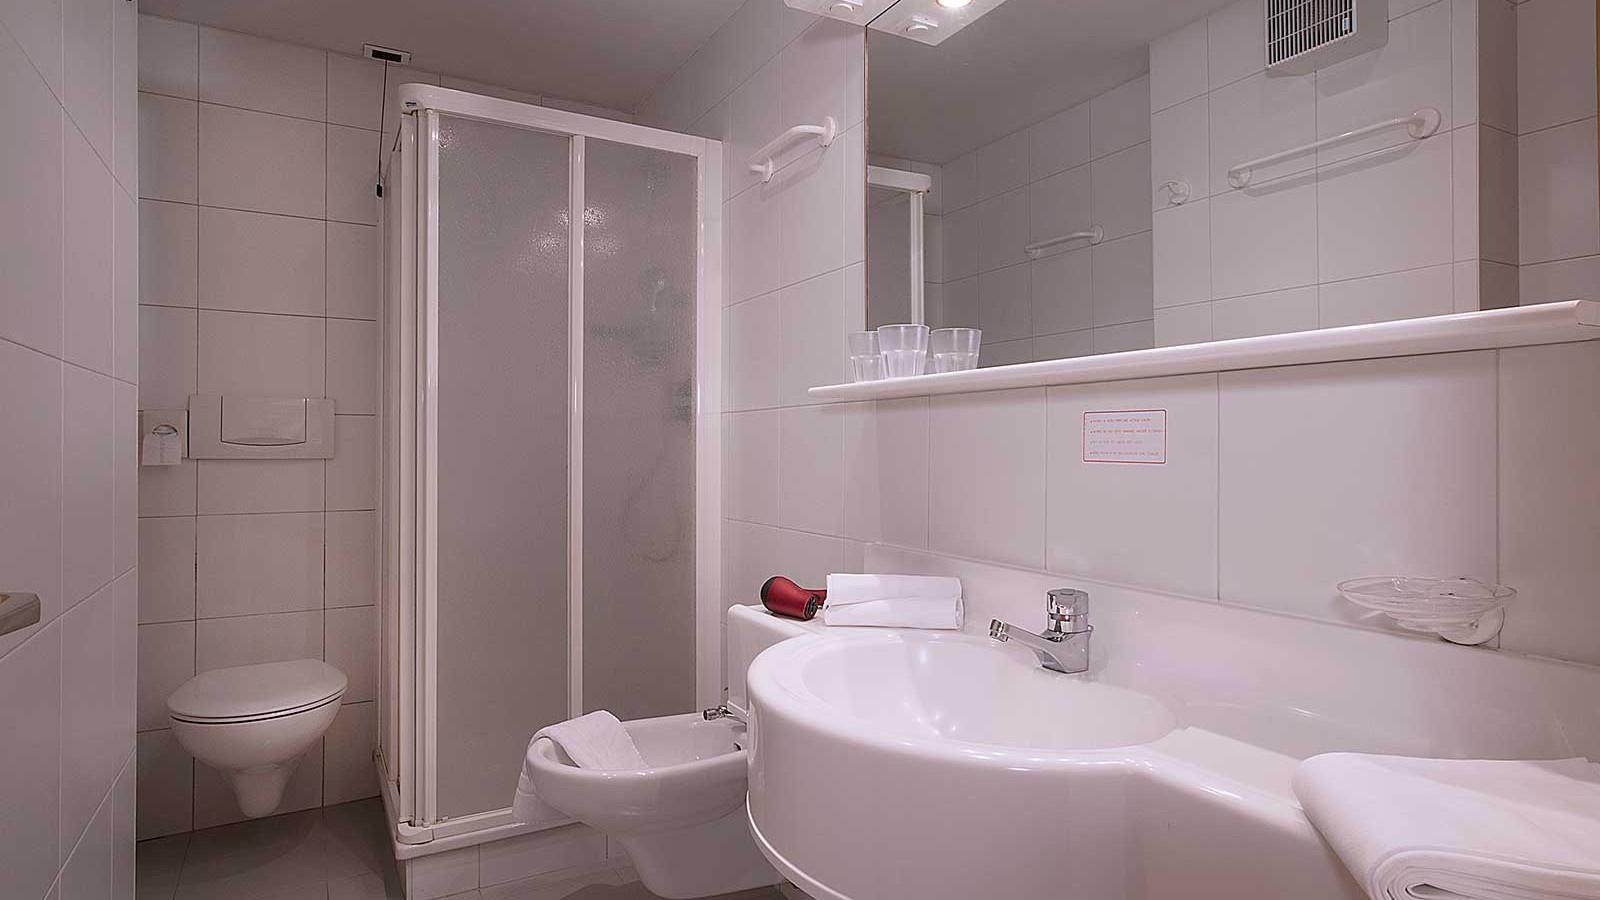 Residence Contrin - Apartments - Bathroom